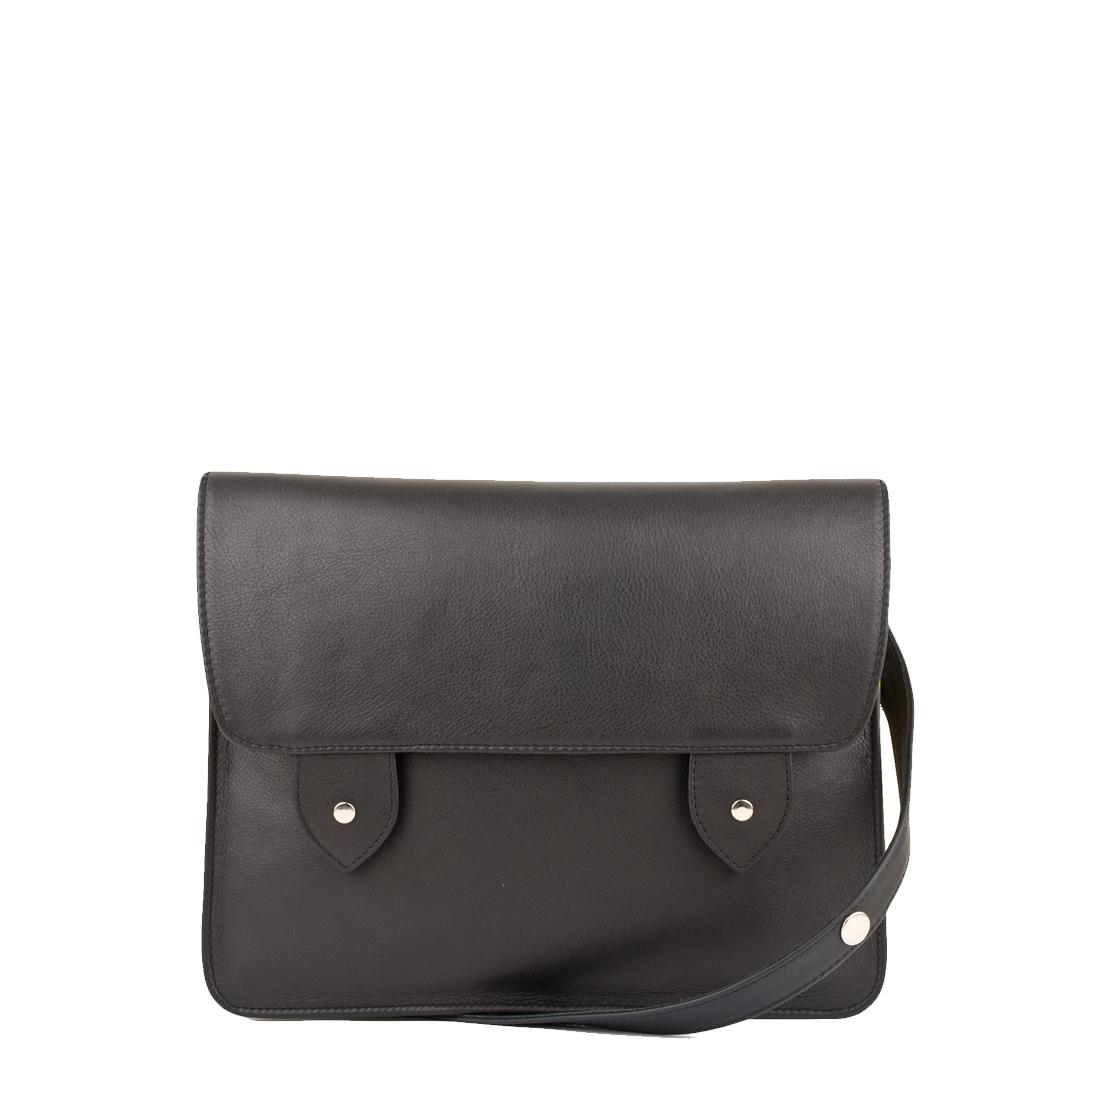 Stella Black Leather Satchel